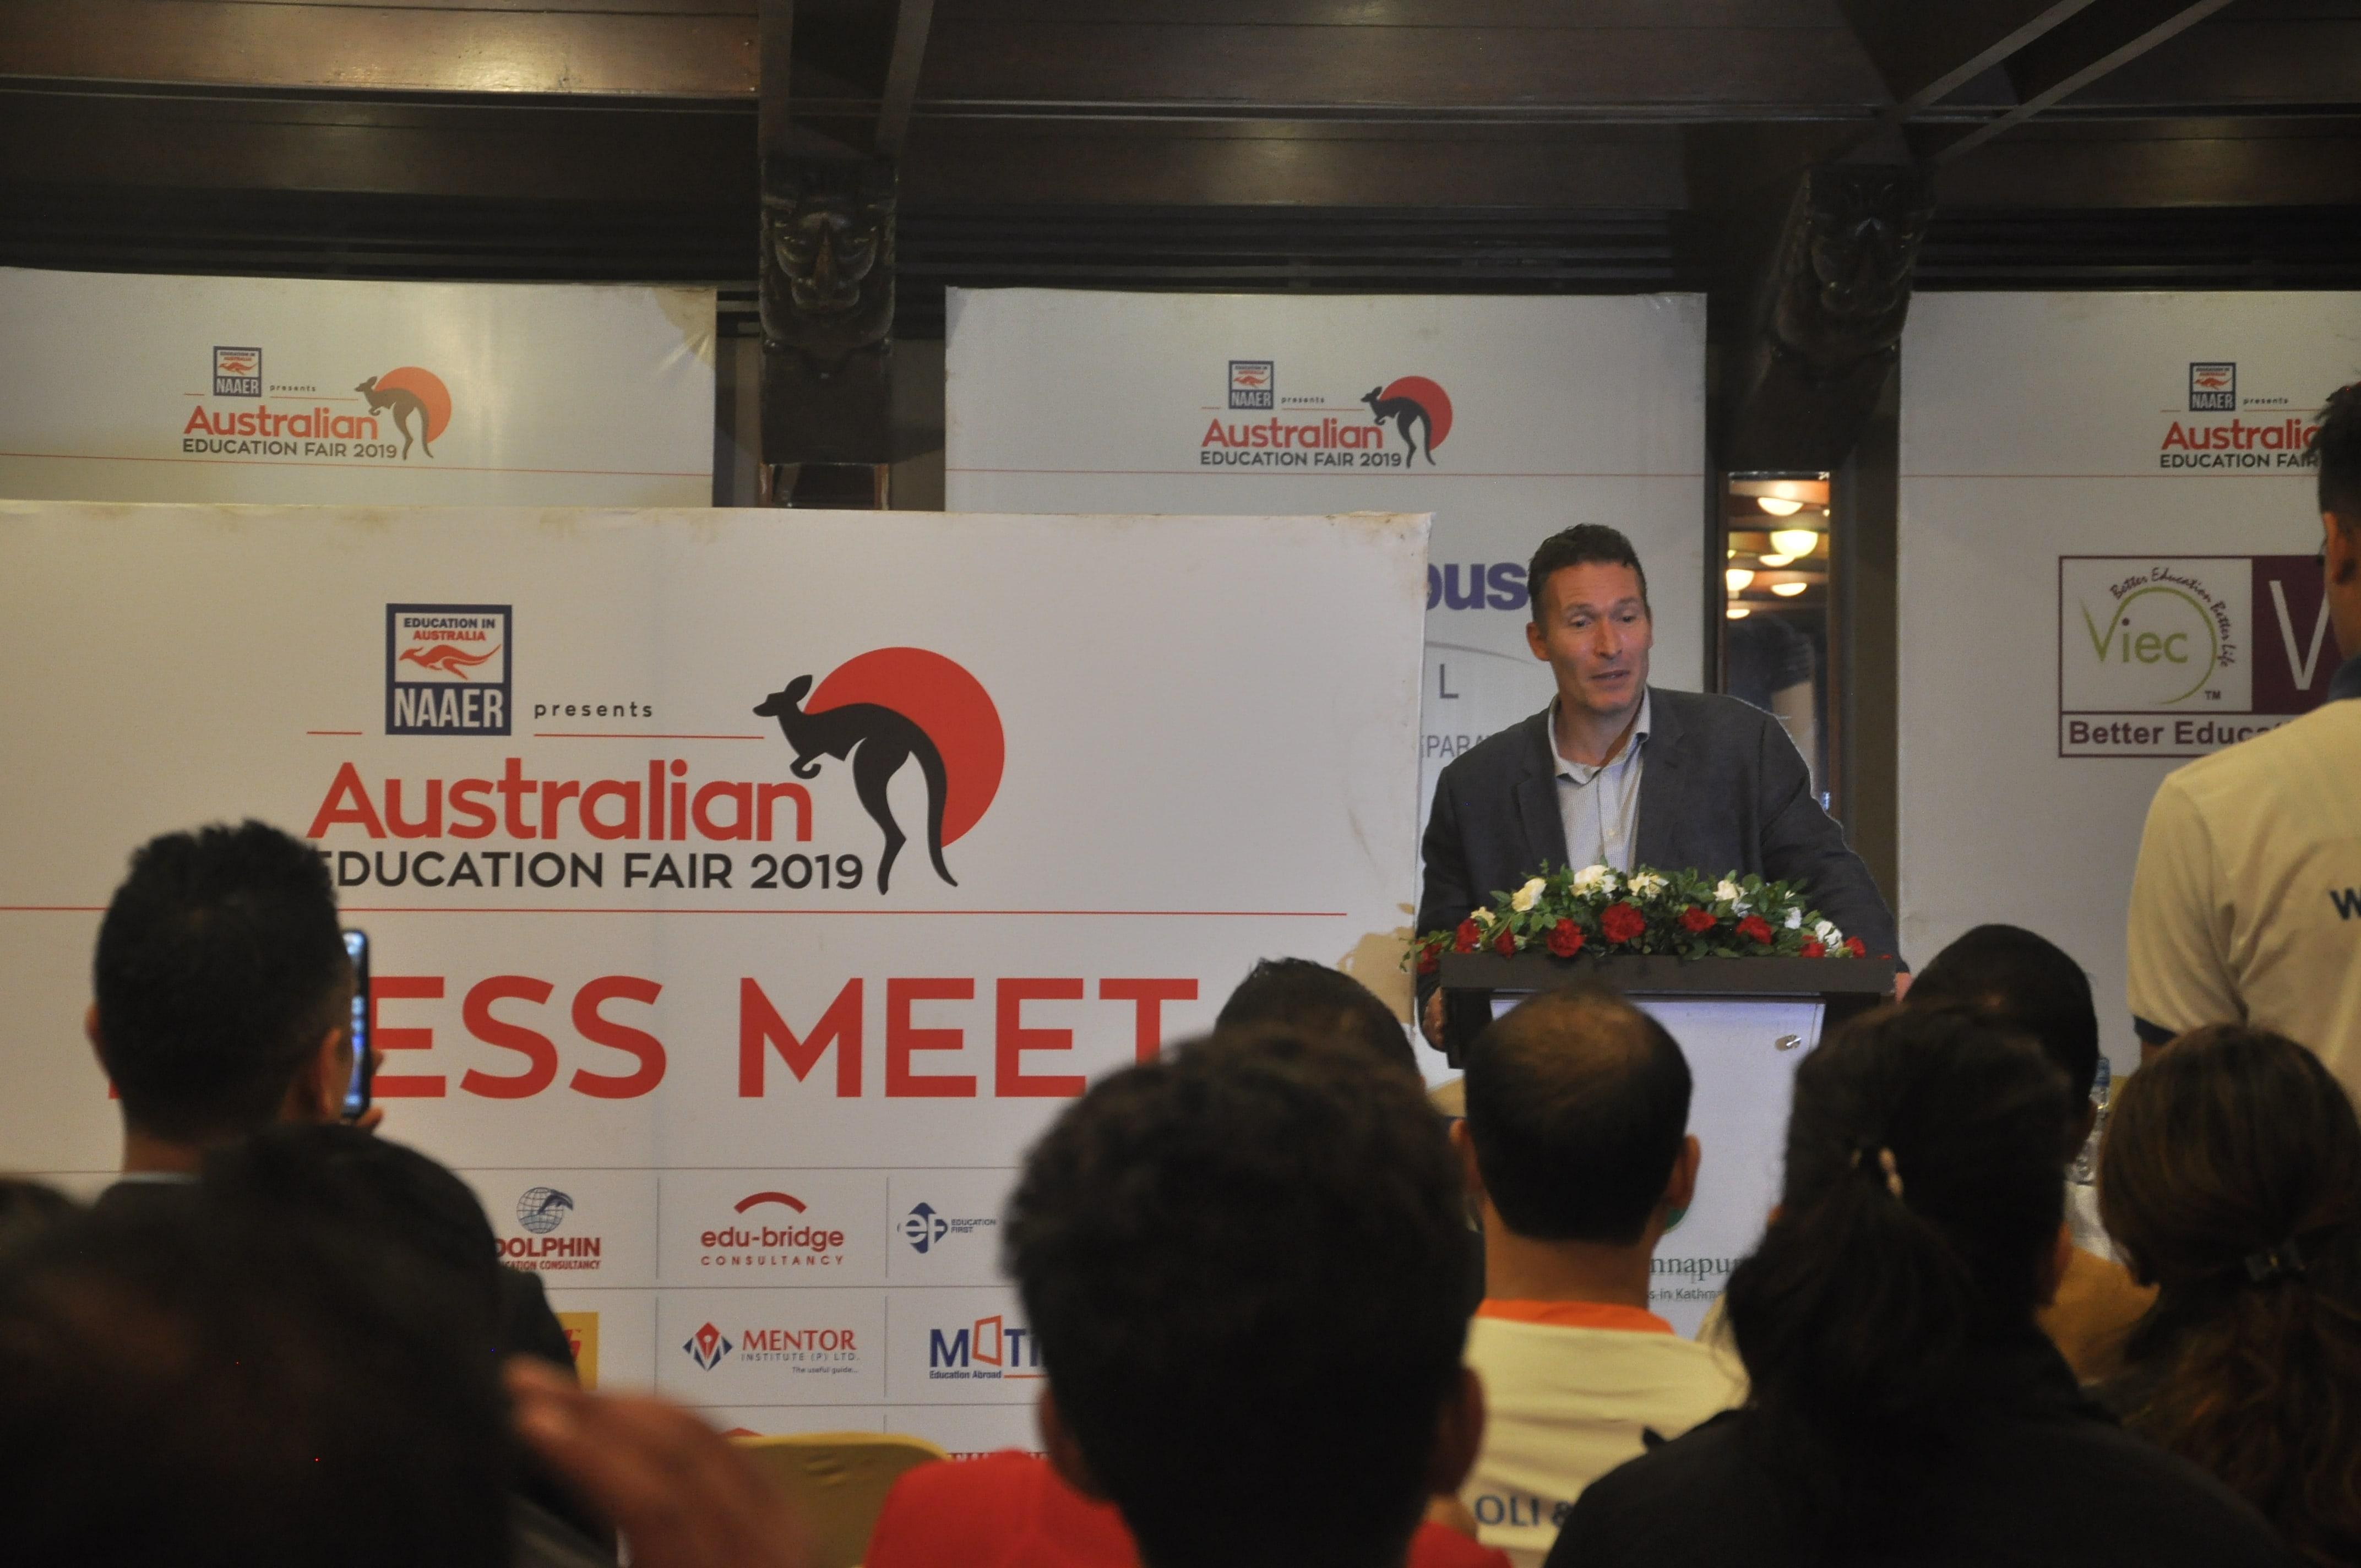 NAAER presents Australian Education Fair